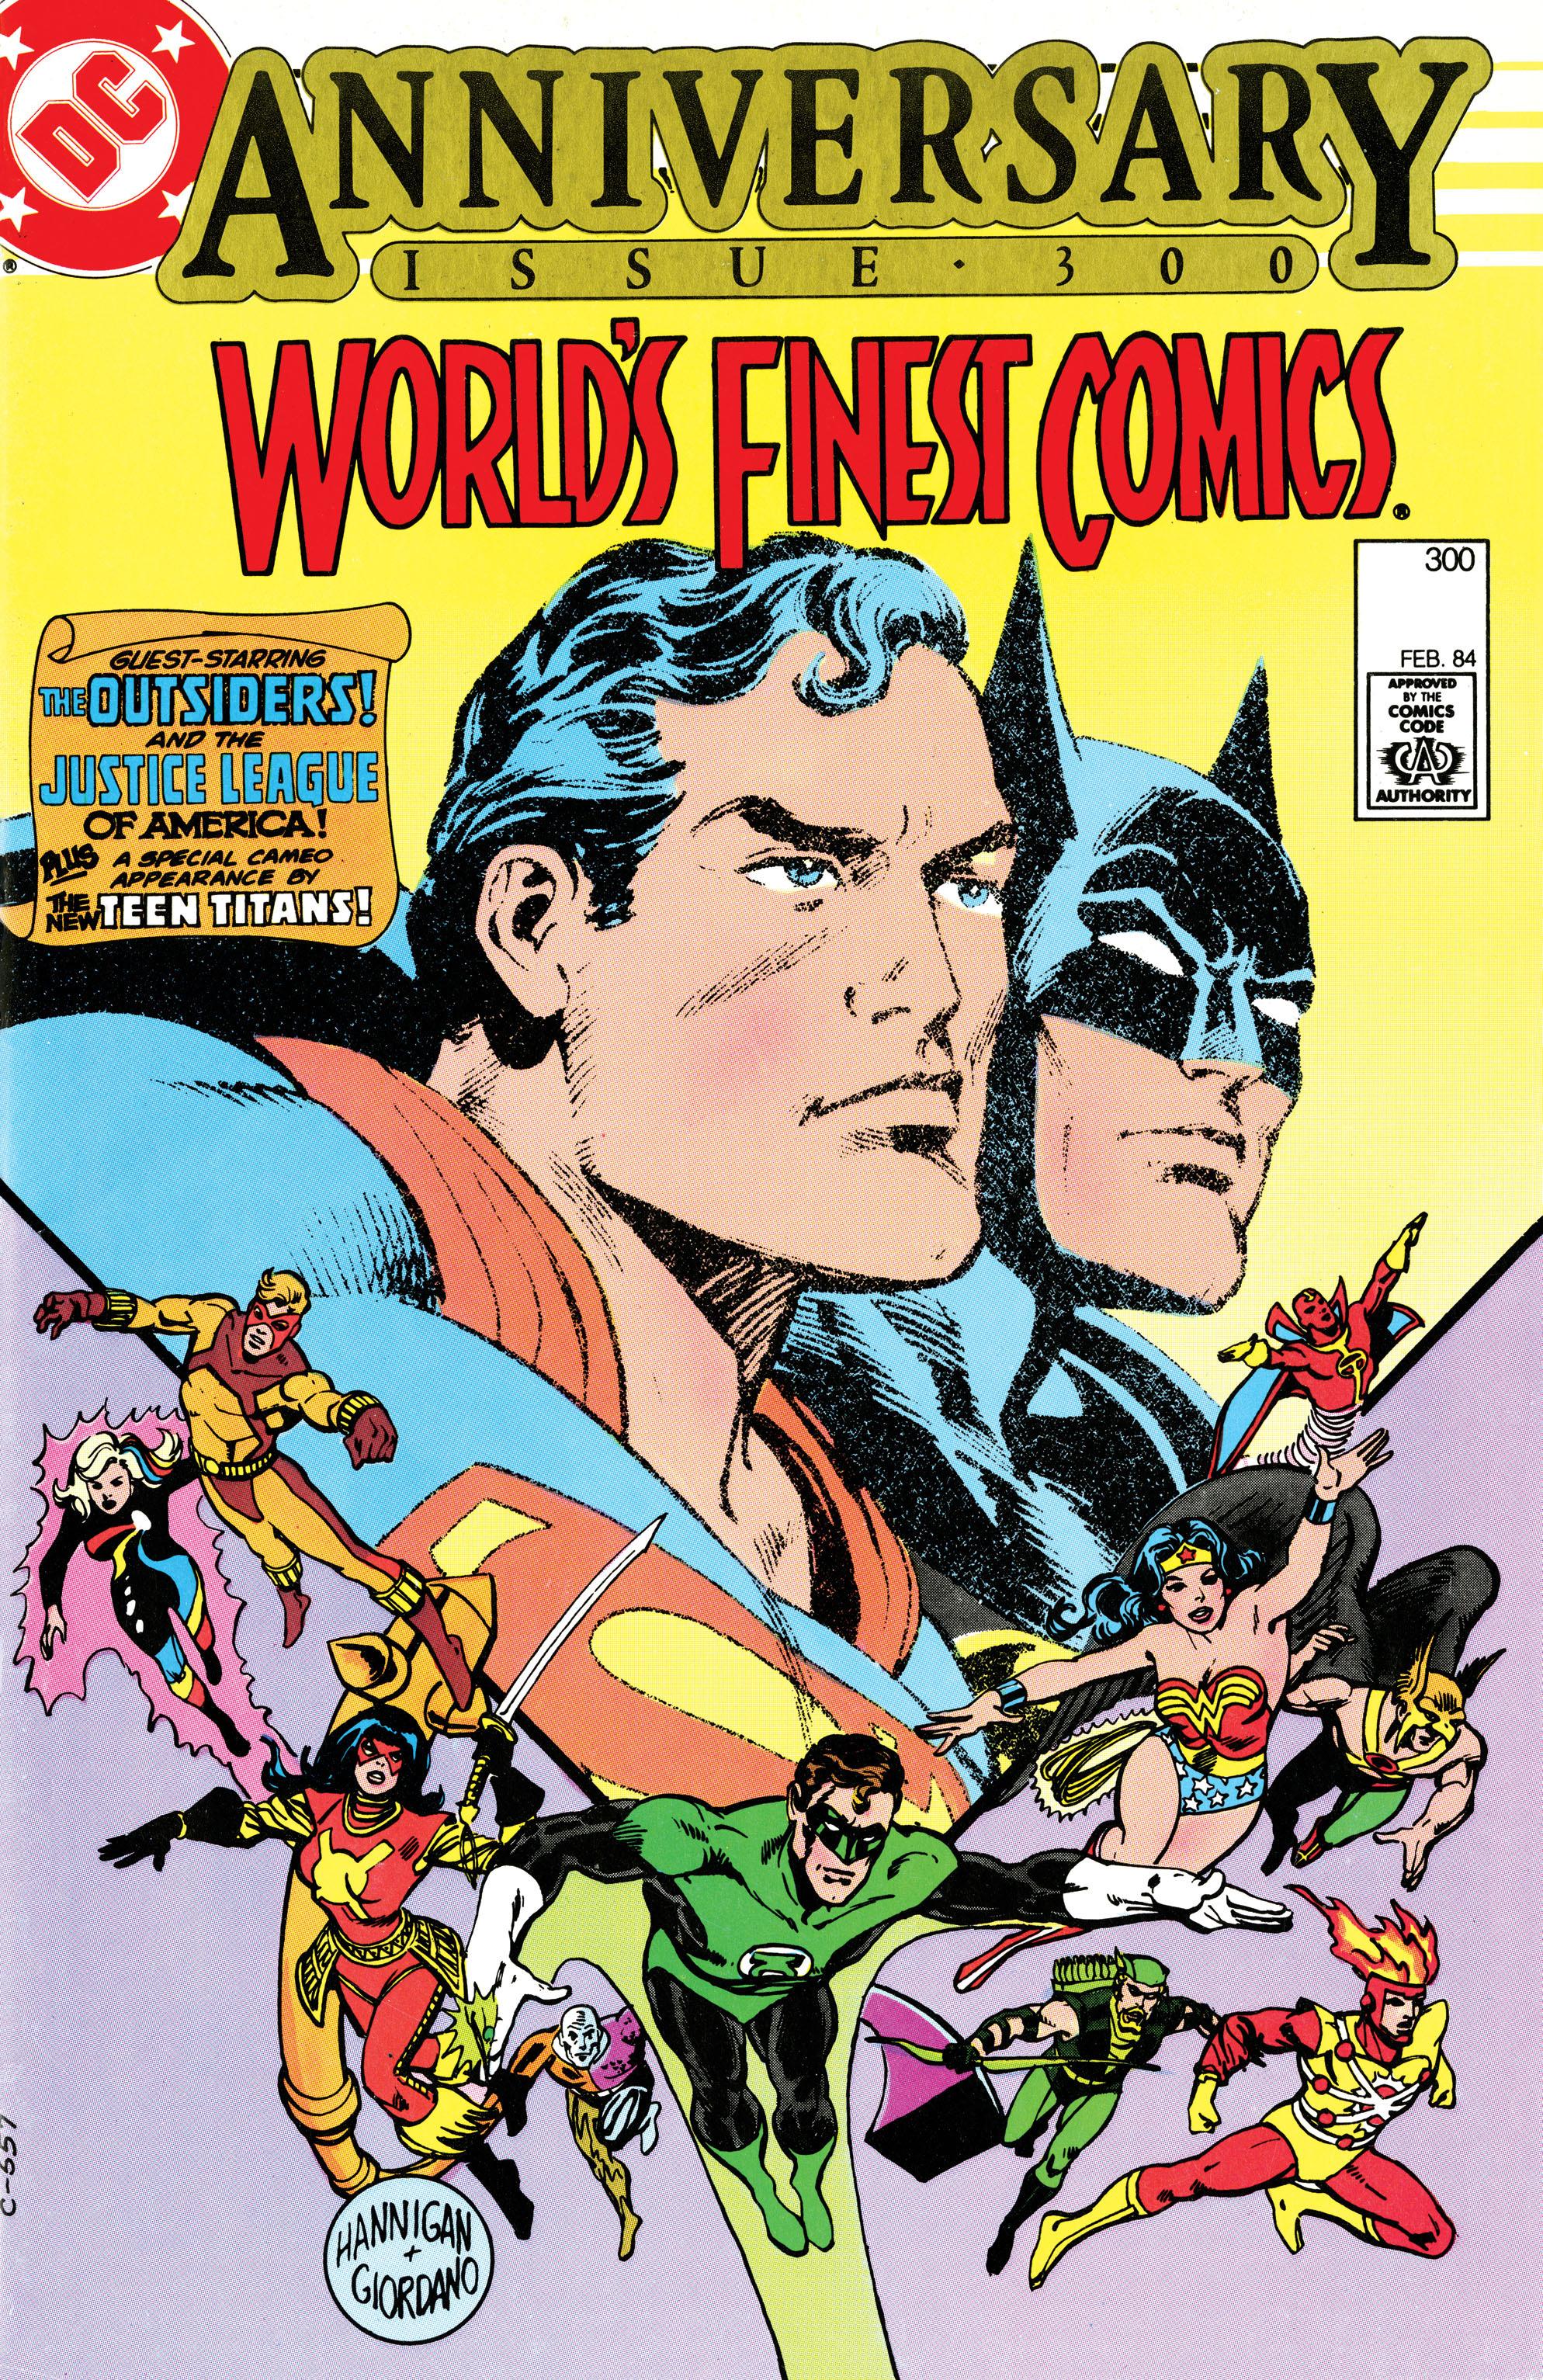 Read online World's Finest Comics comic -  Issue #300 - 1